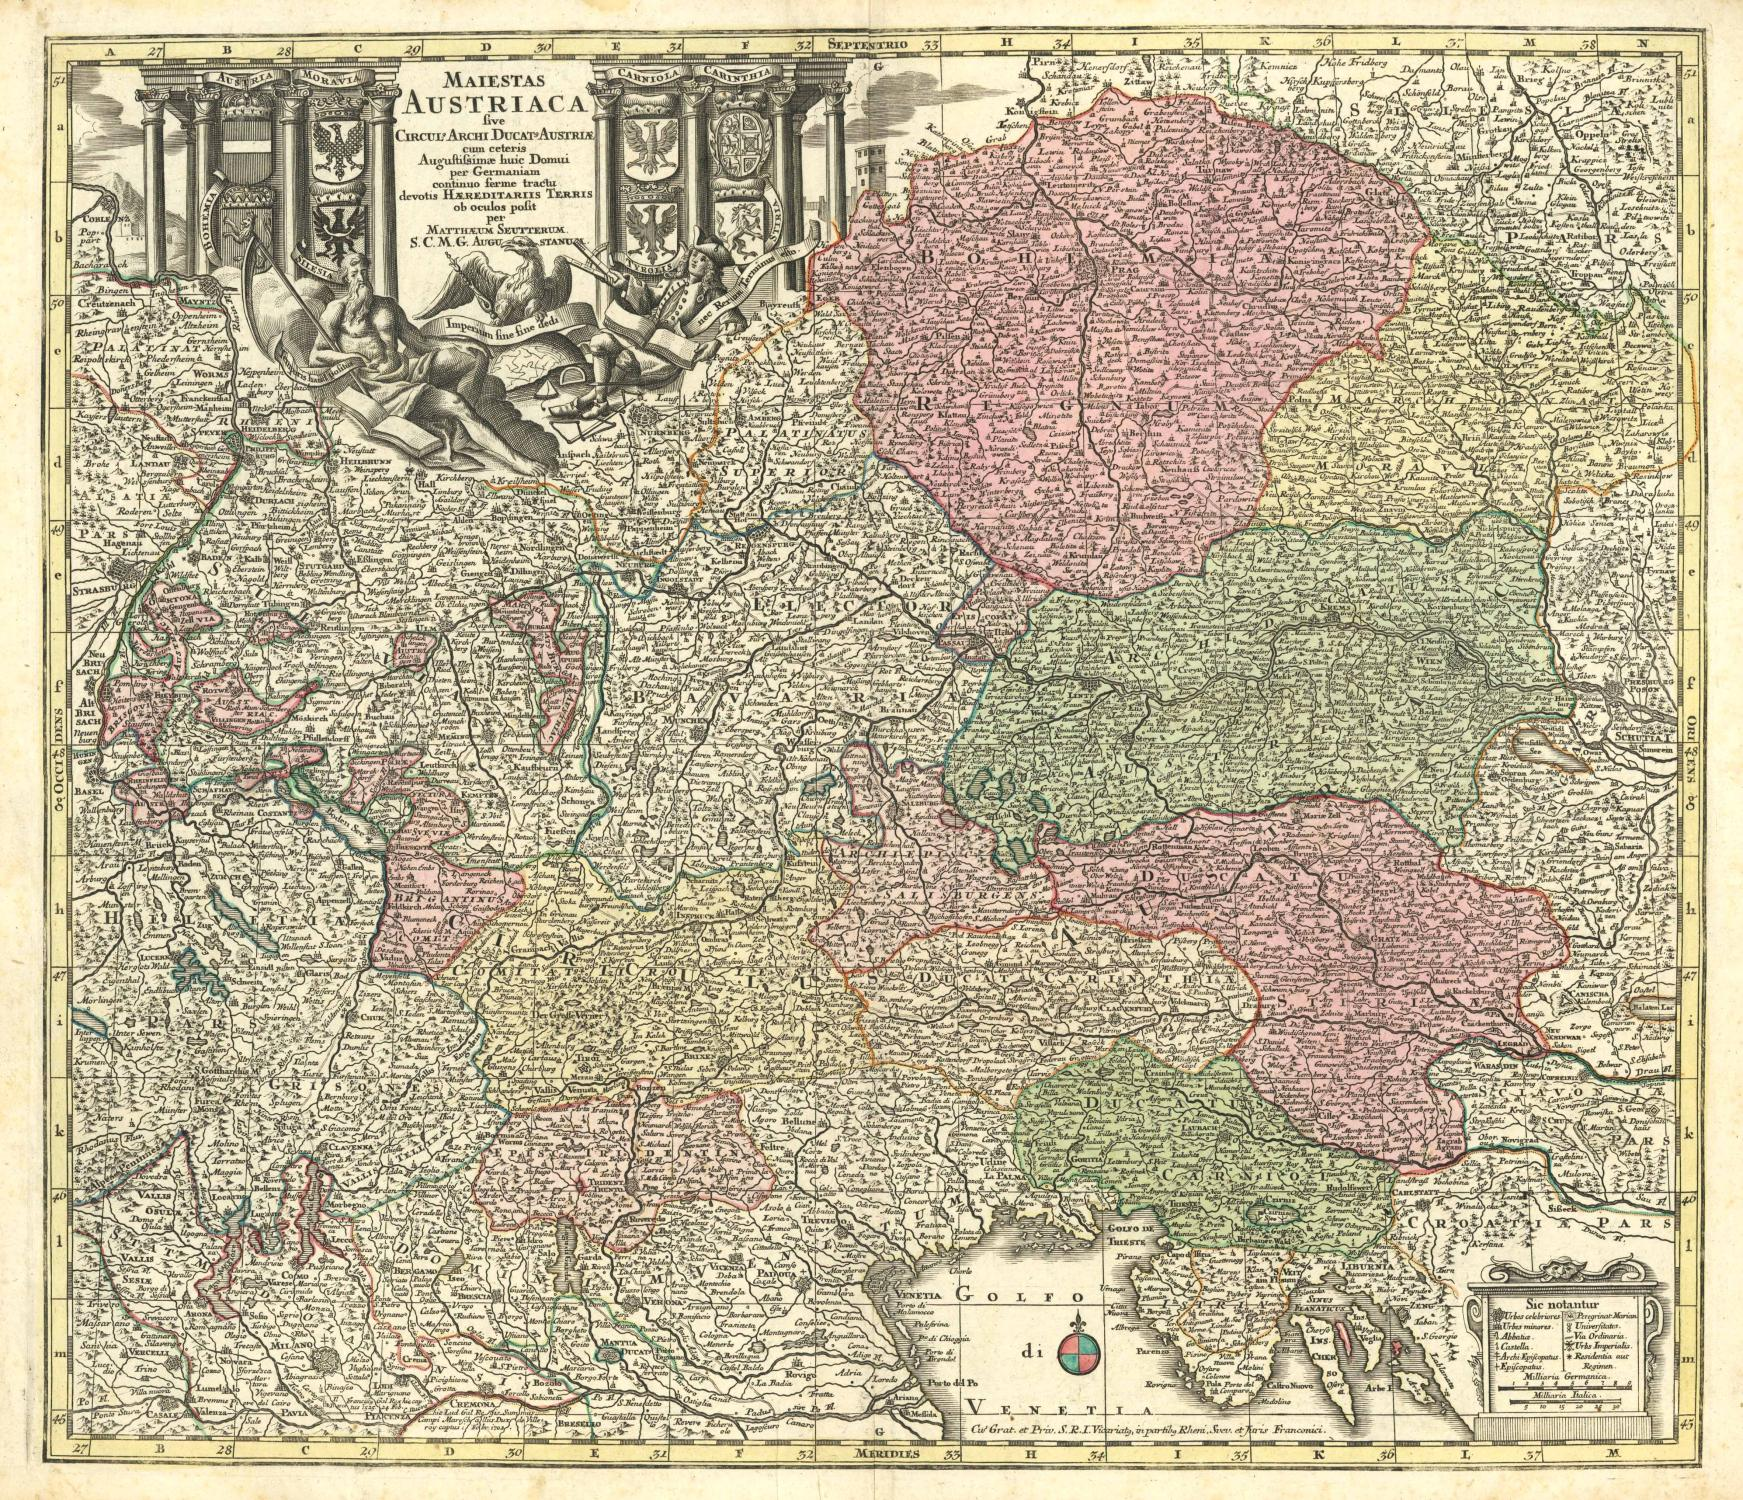 Maiestas Austriaca sive Circul Archi Ducat Austriae: ÖSTERREICH (Austria) -